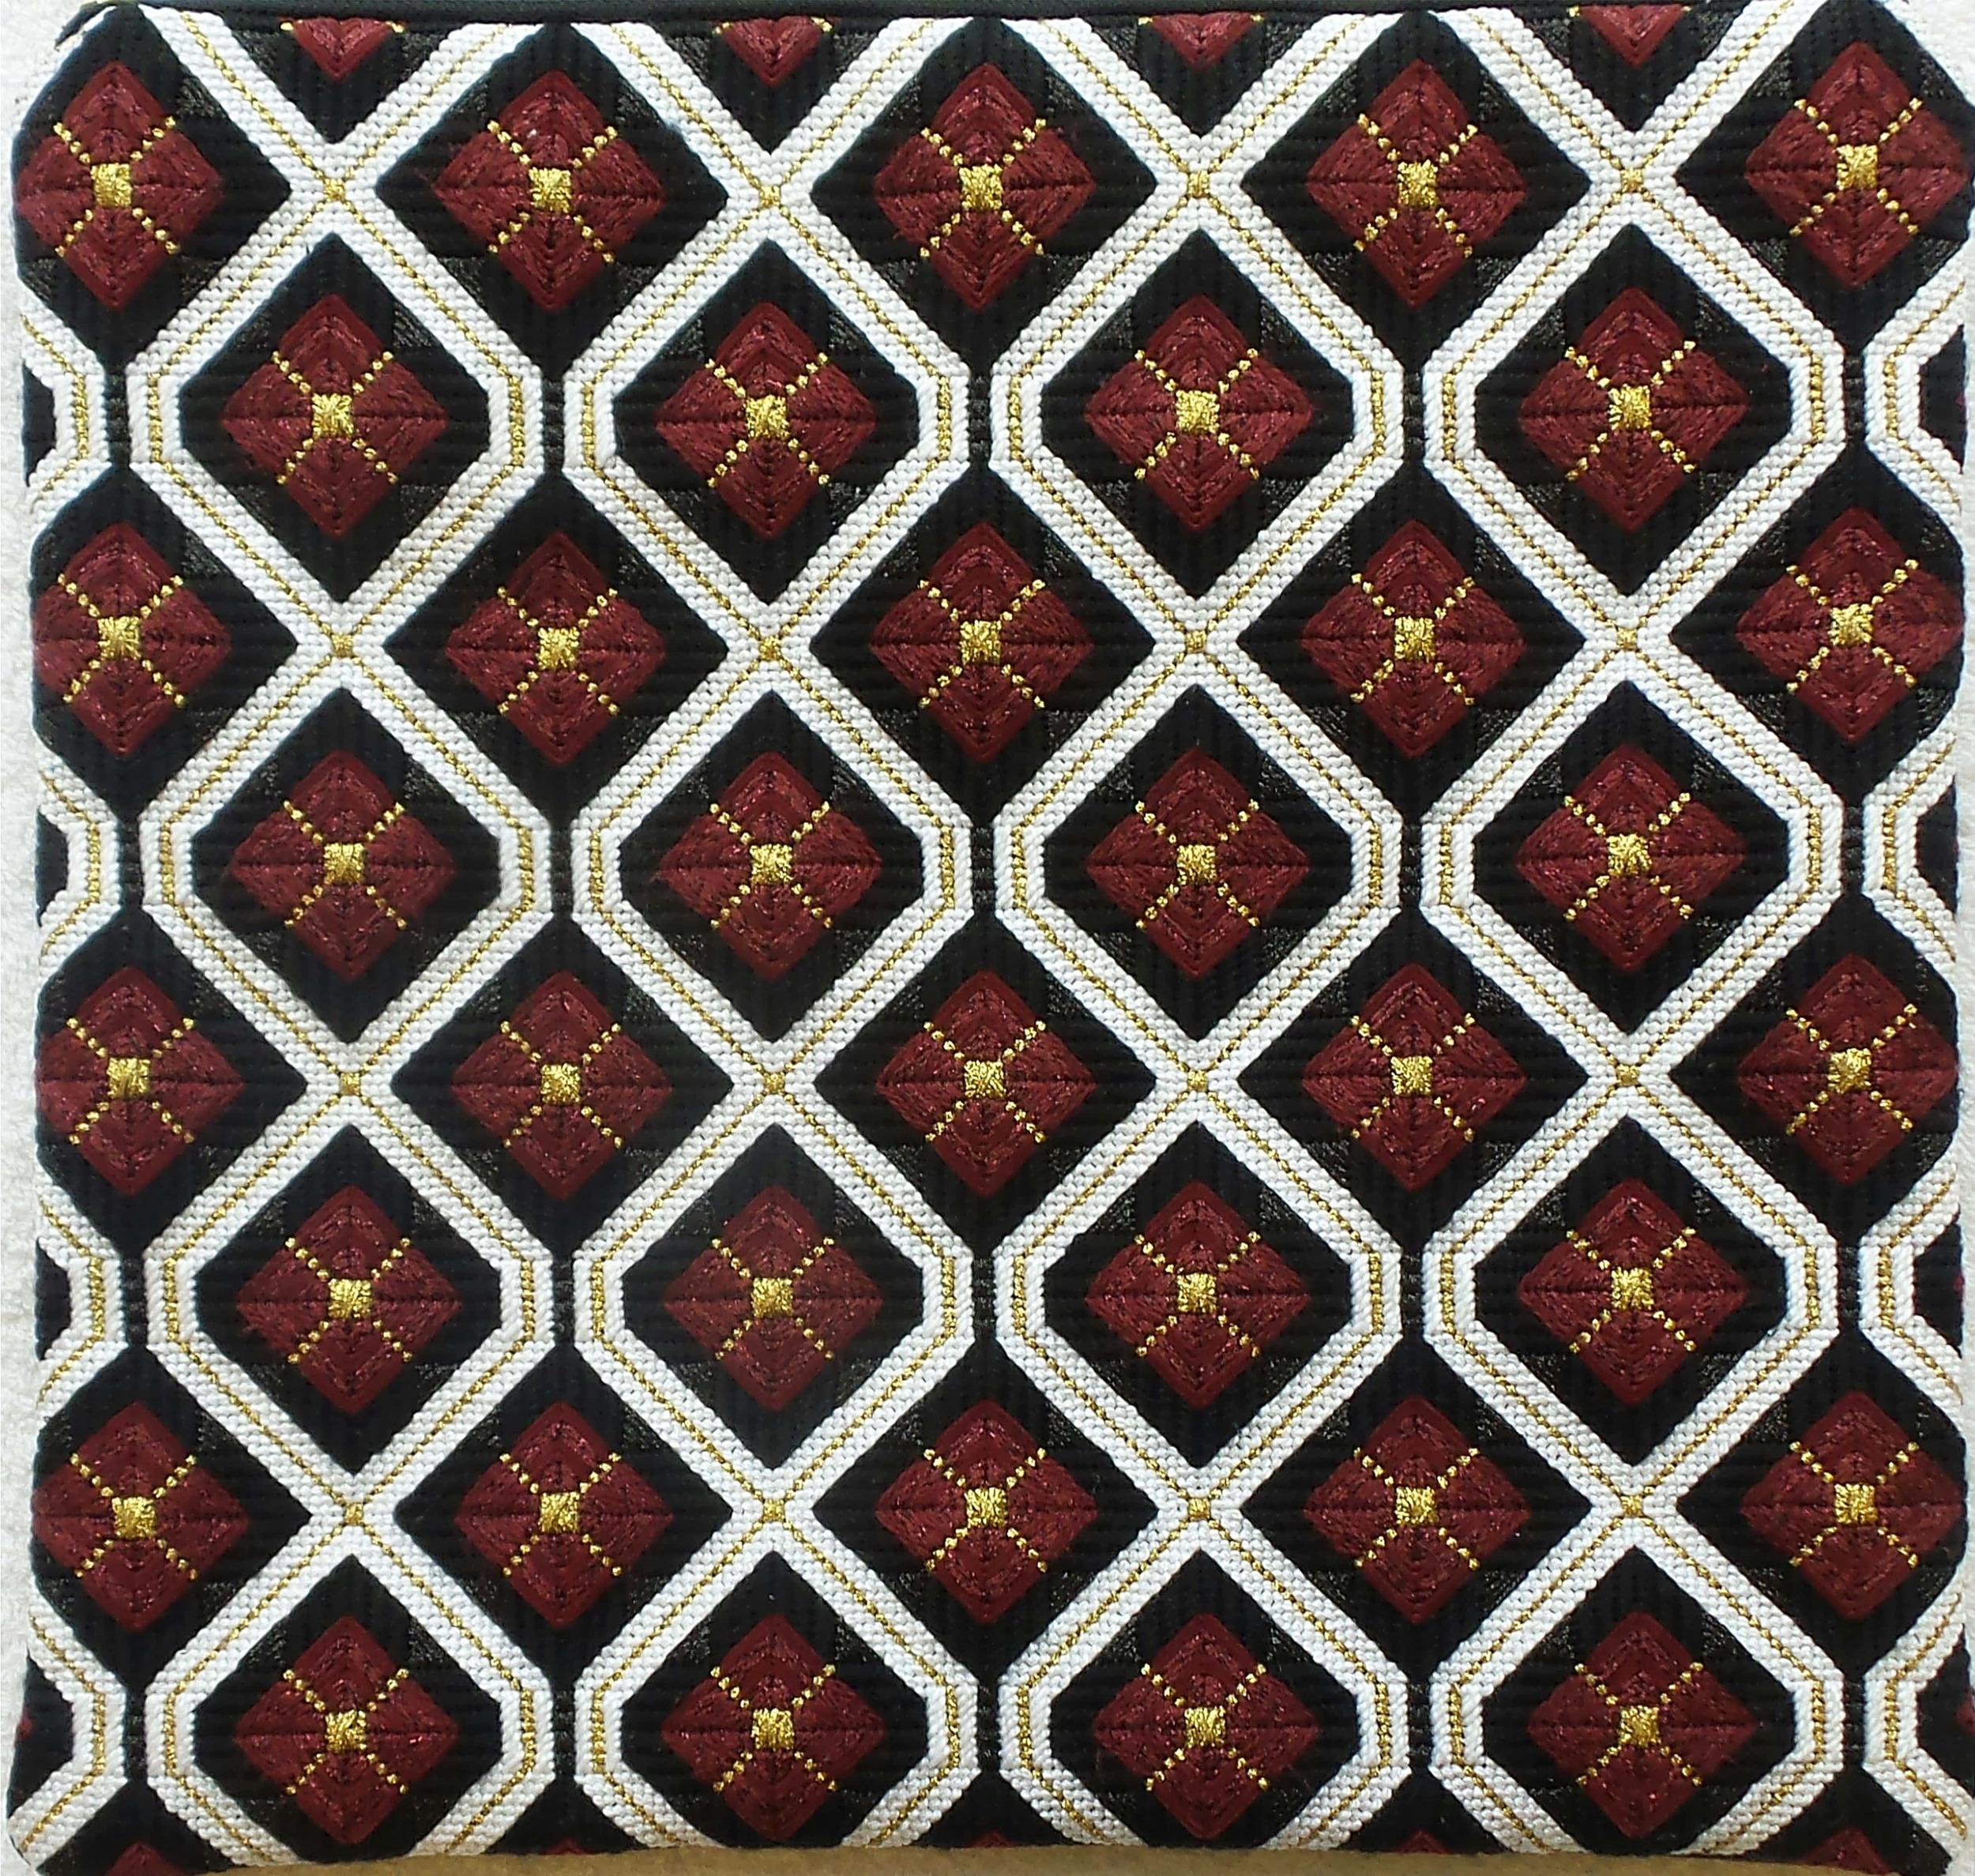 needlepoint tallis canvas CG-22 .jpg